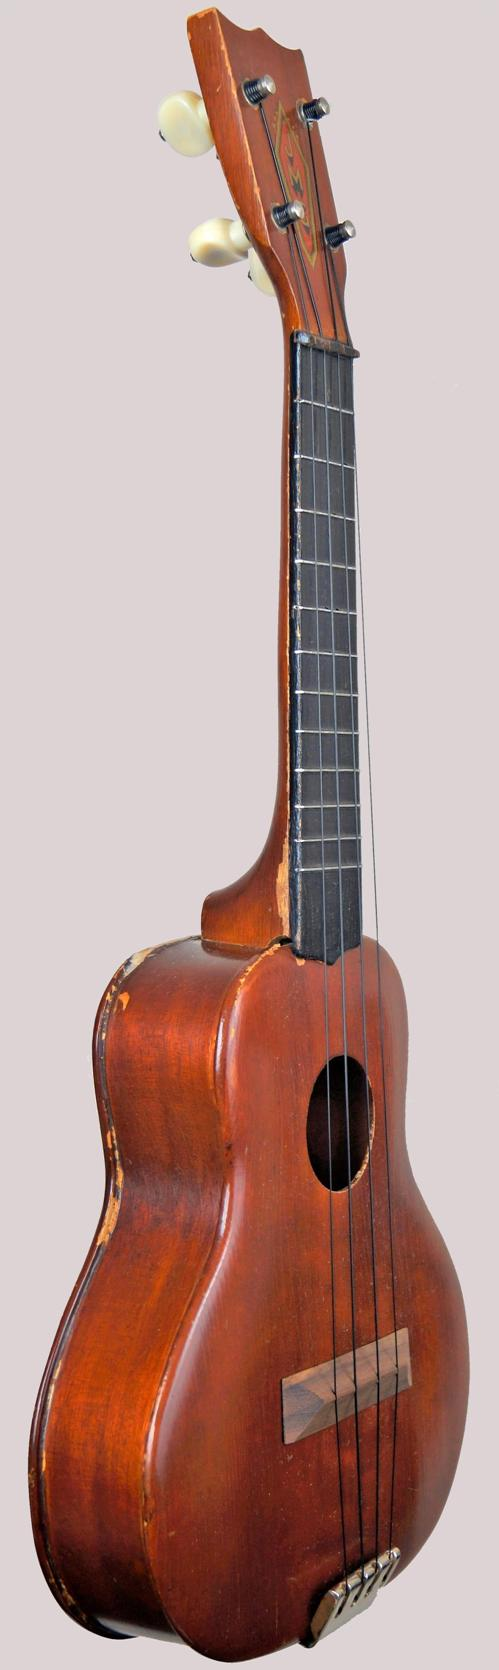 violin style archtop ukulele